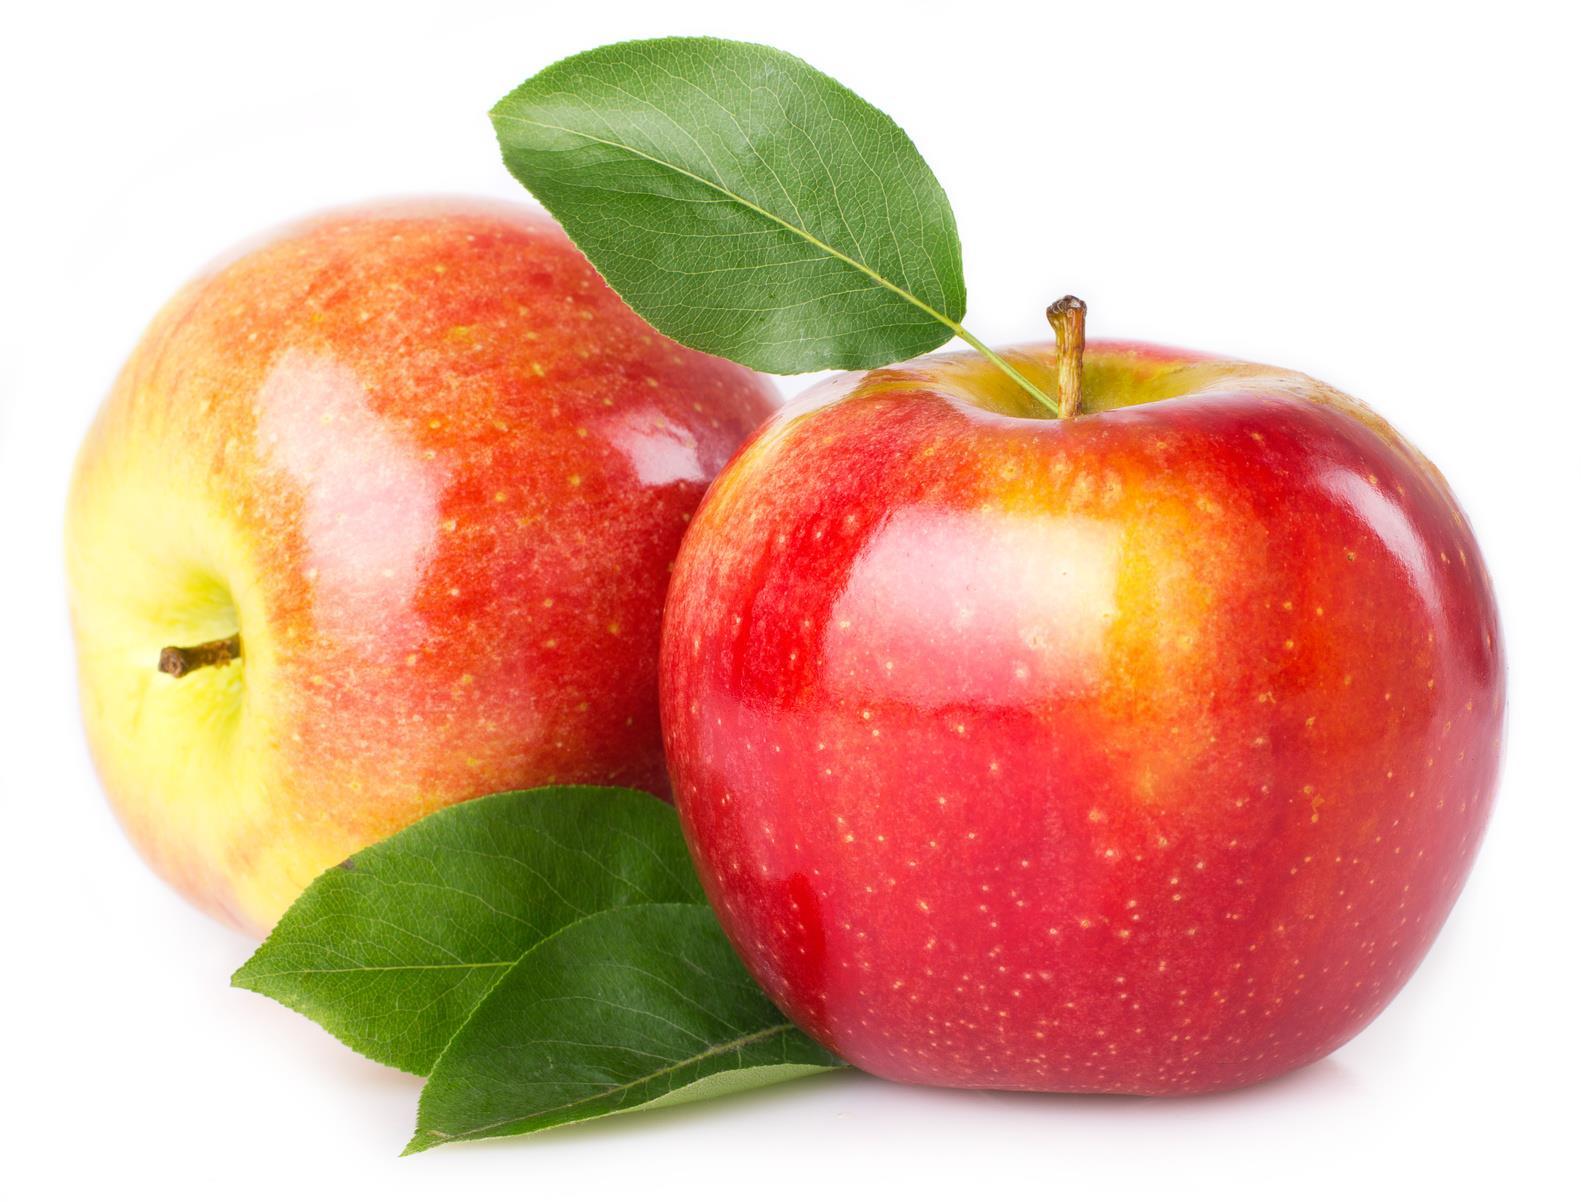 elma Elmasıyla Ünlü İlimiz Hangisidir